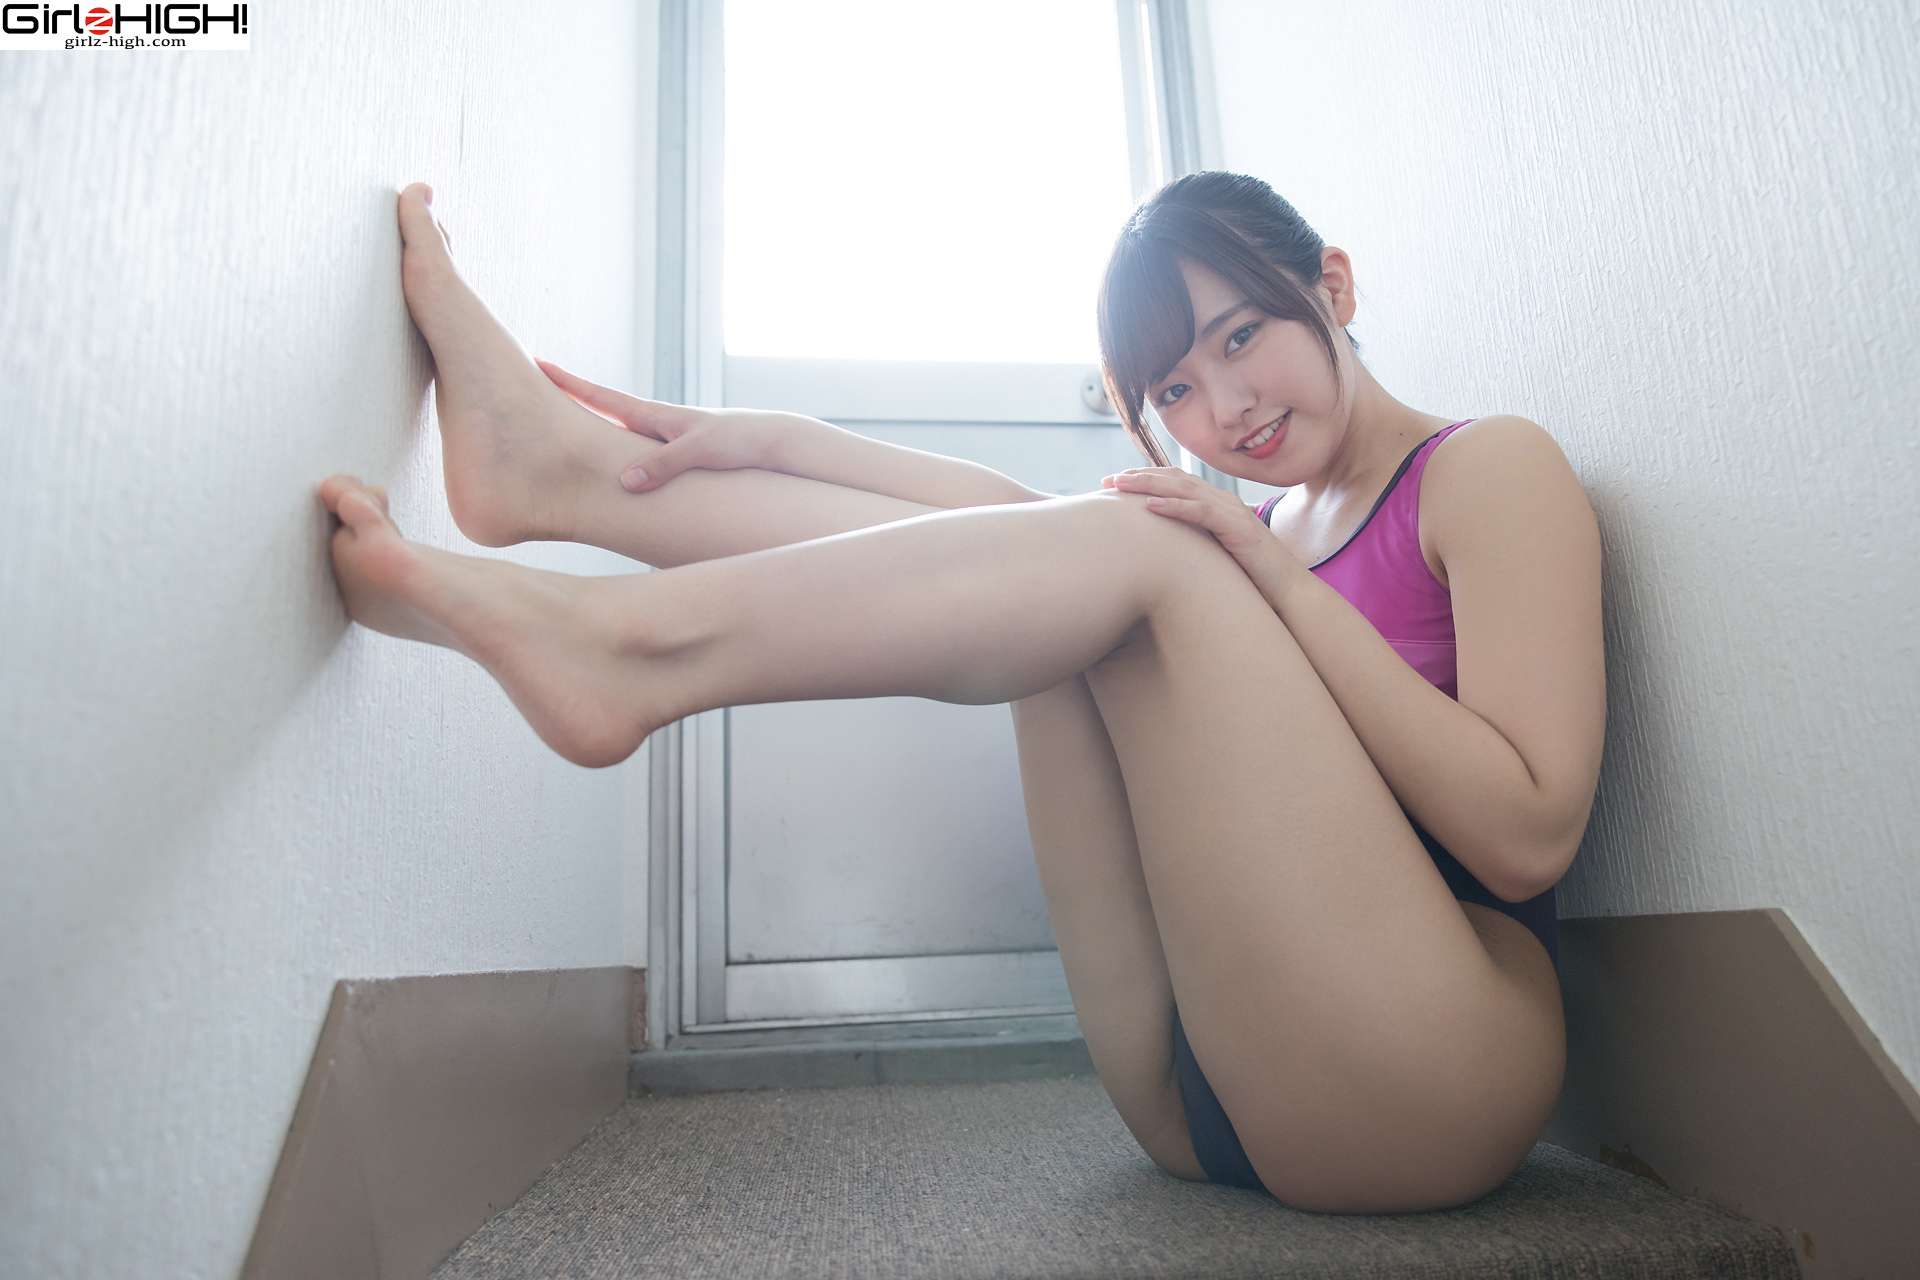 photo_028.jpg